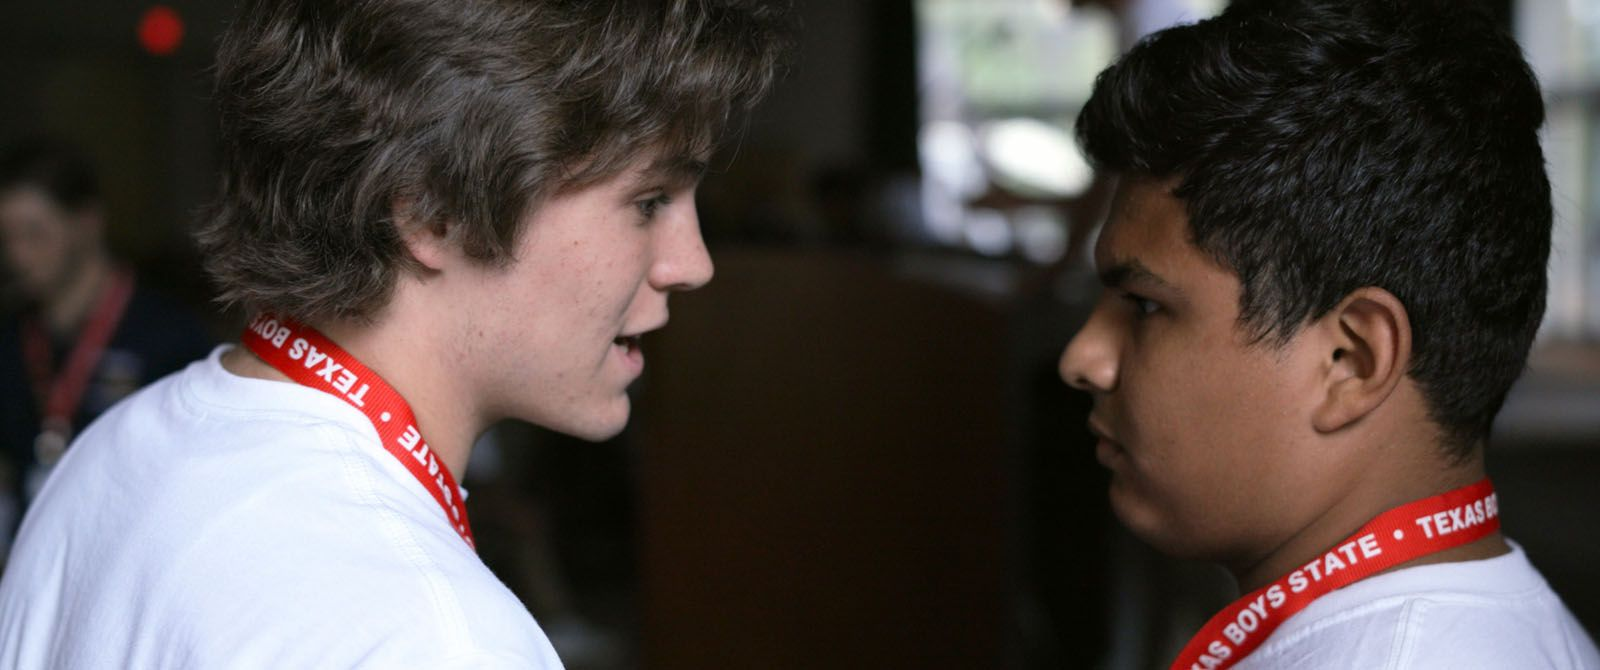 Boys State (BANDE-ANNONCE) Documentaire de Amanda McBaine et Jesse Moss